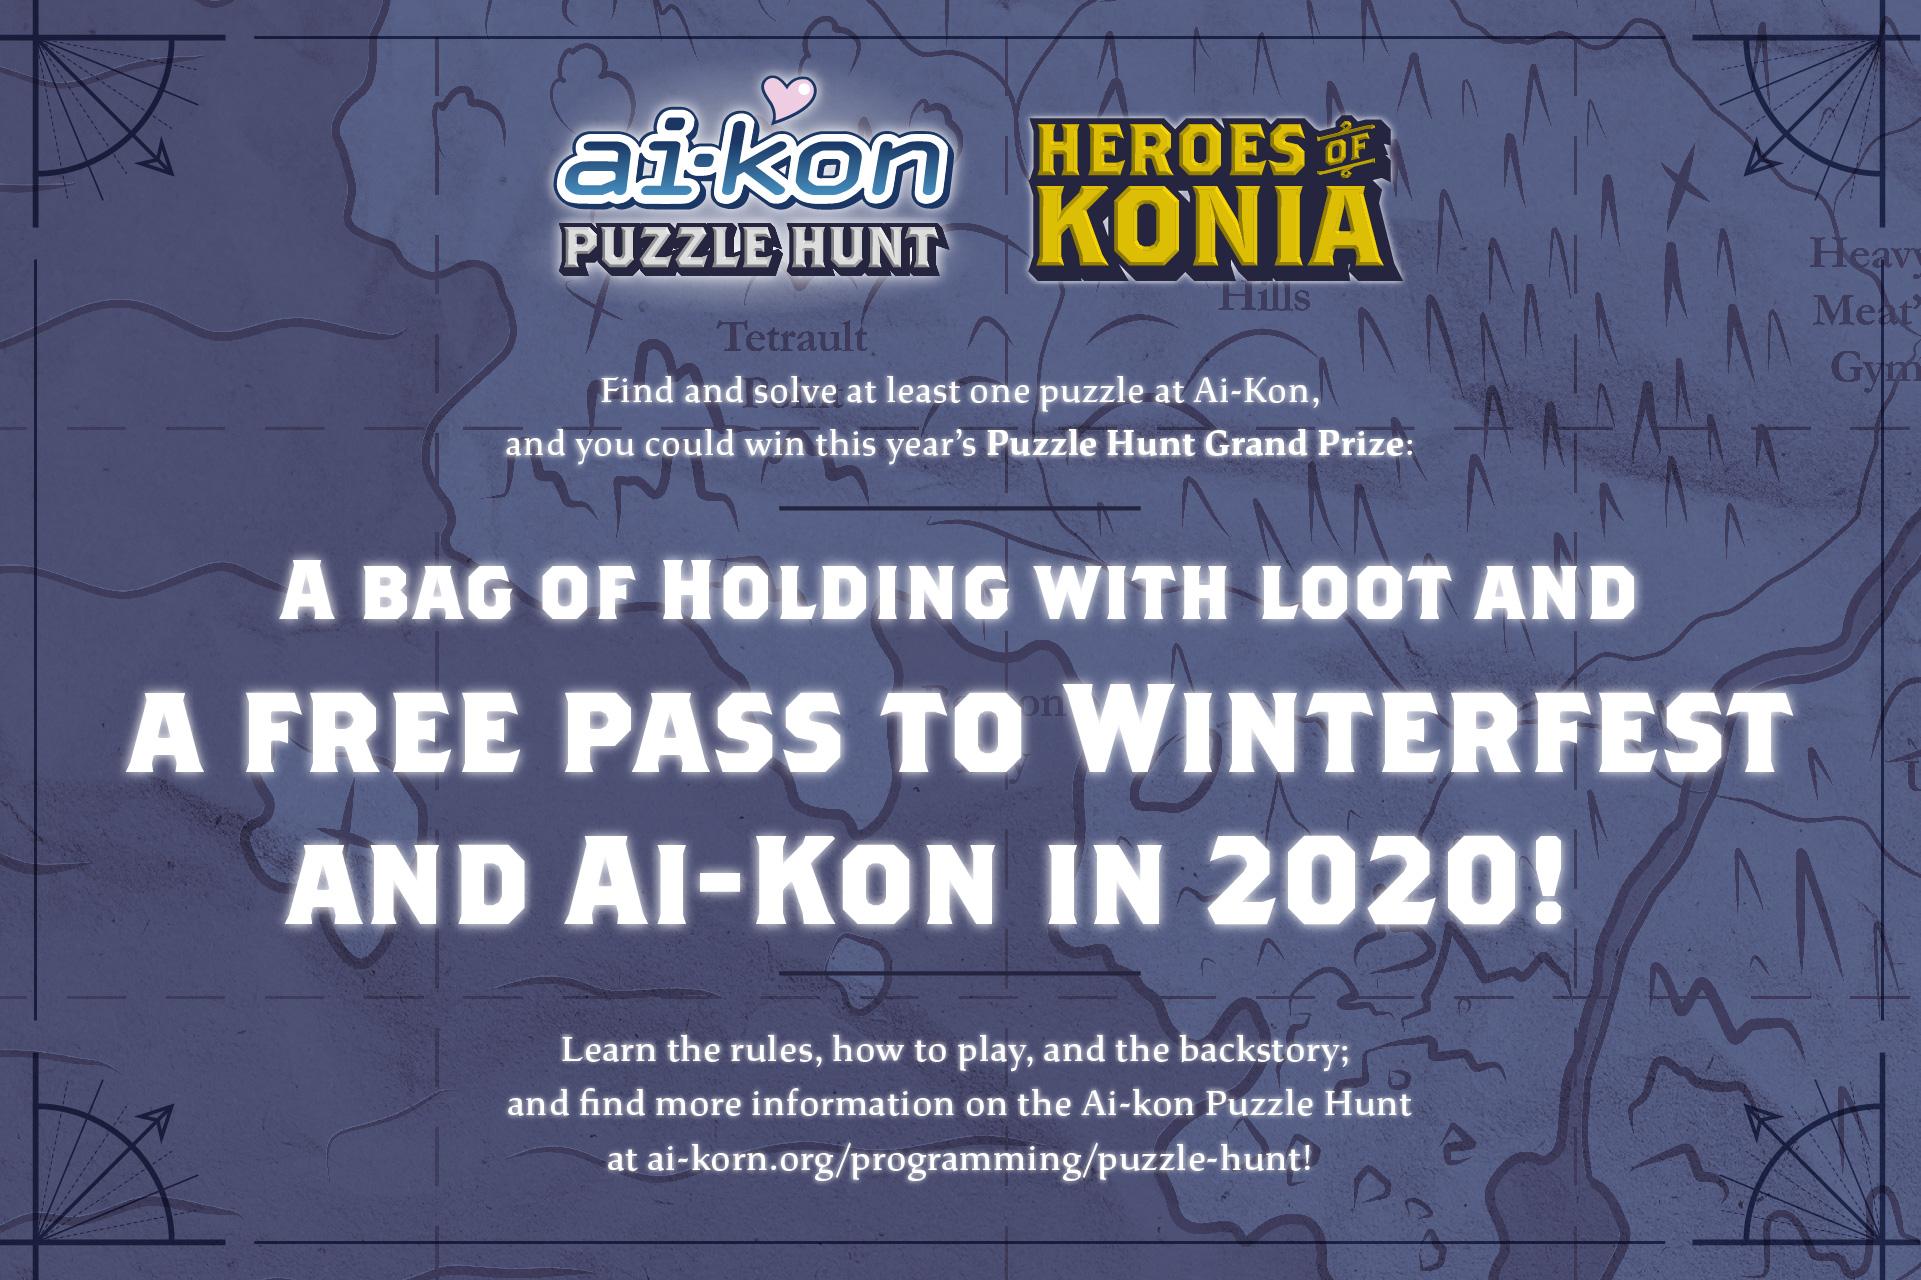 Ai-Kon » Save Konia and Win Tickets to Winterfest and Ai-Kon